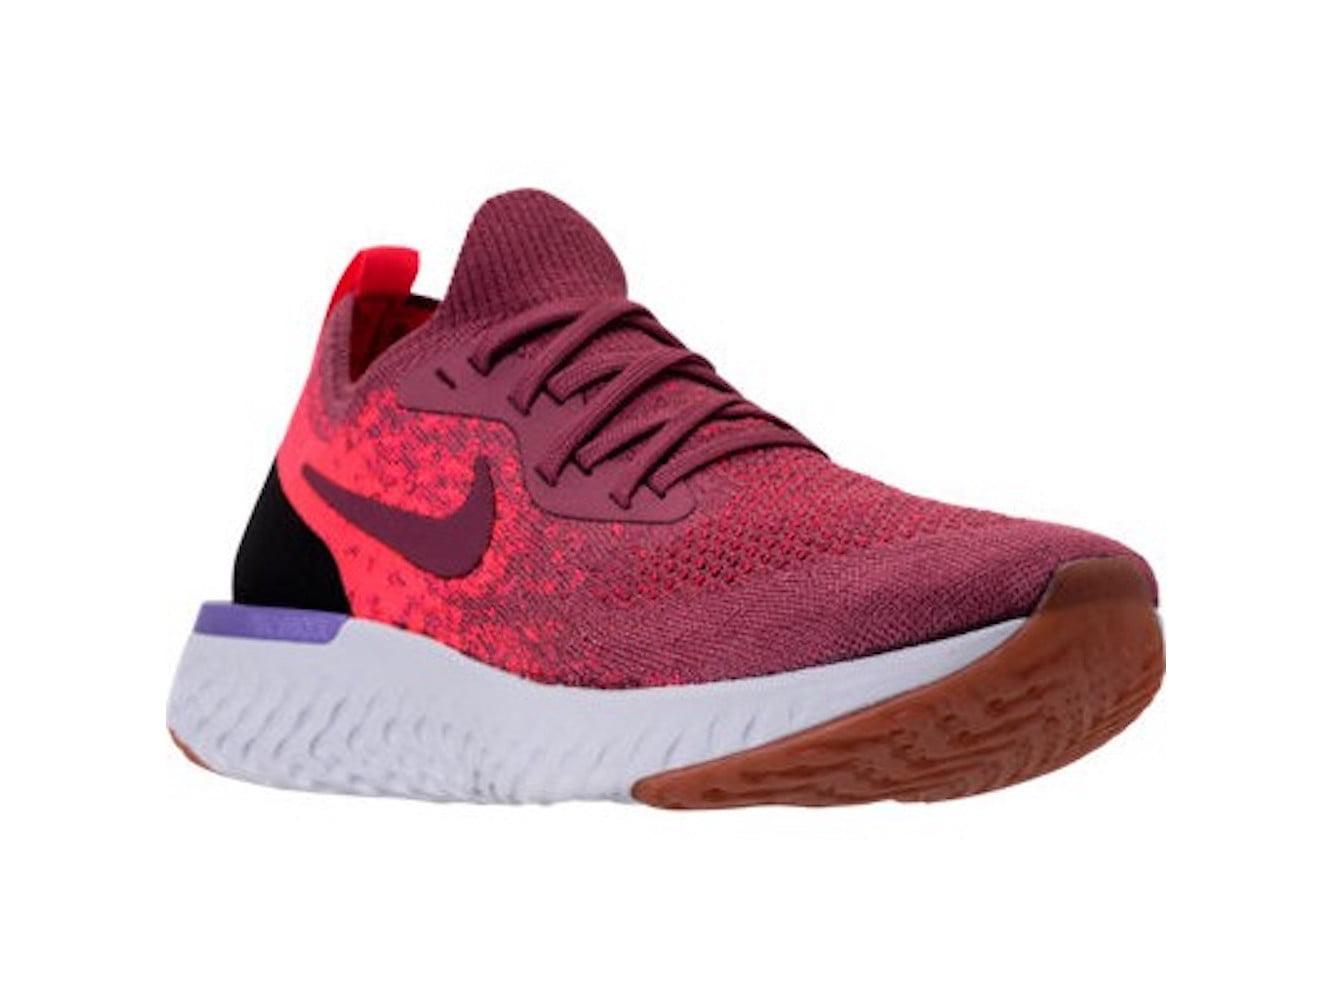 Nike Womens Epic React Flyknit Fabric